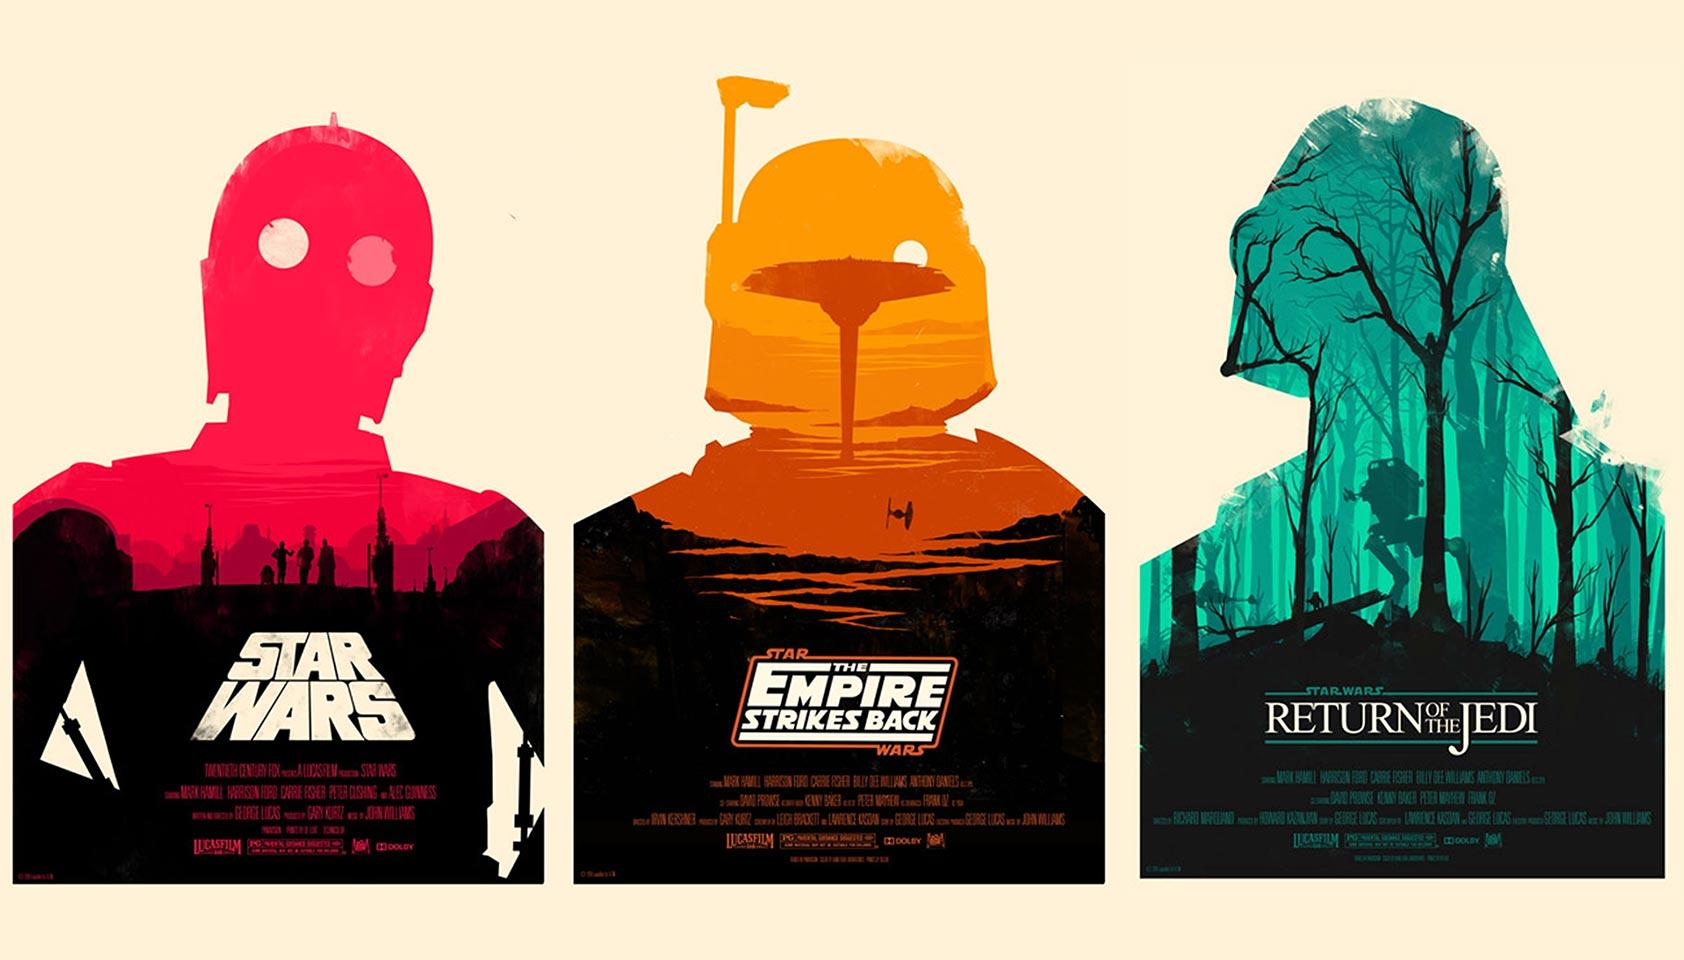 Classic film posters reimagined